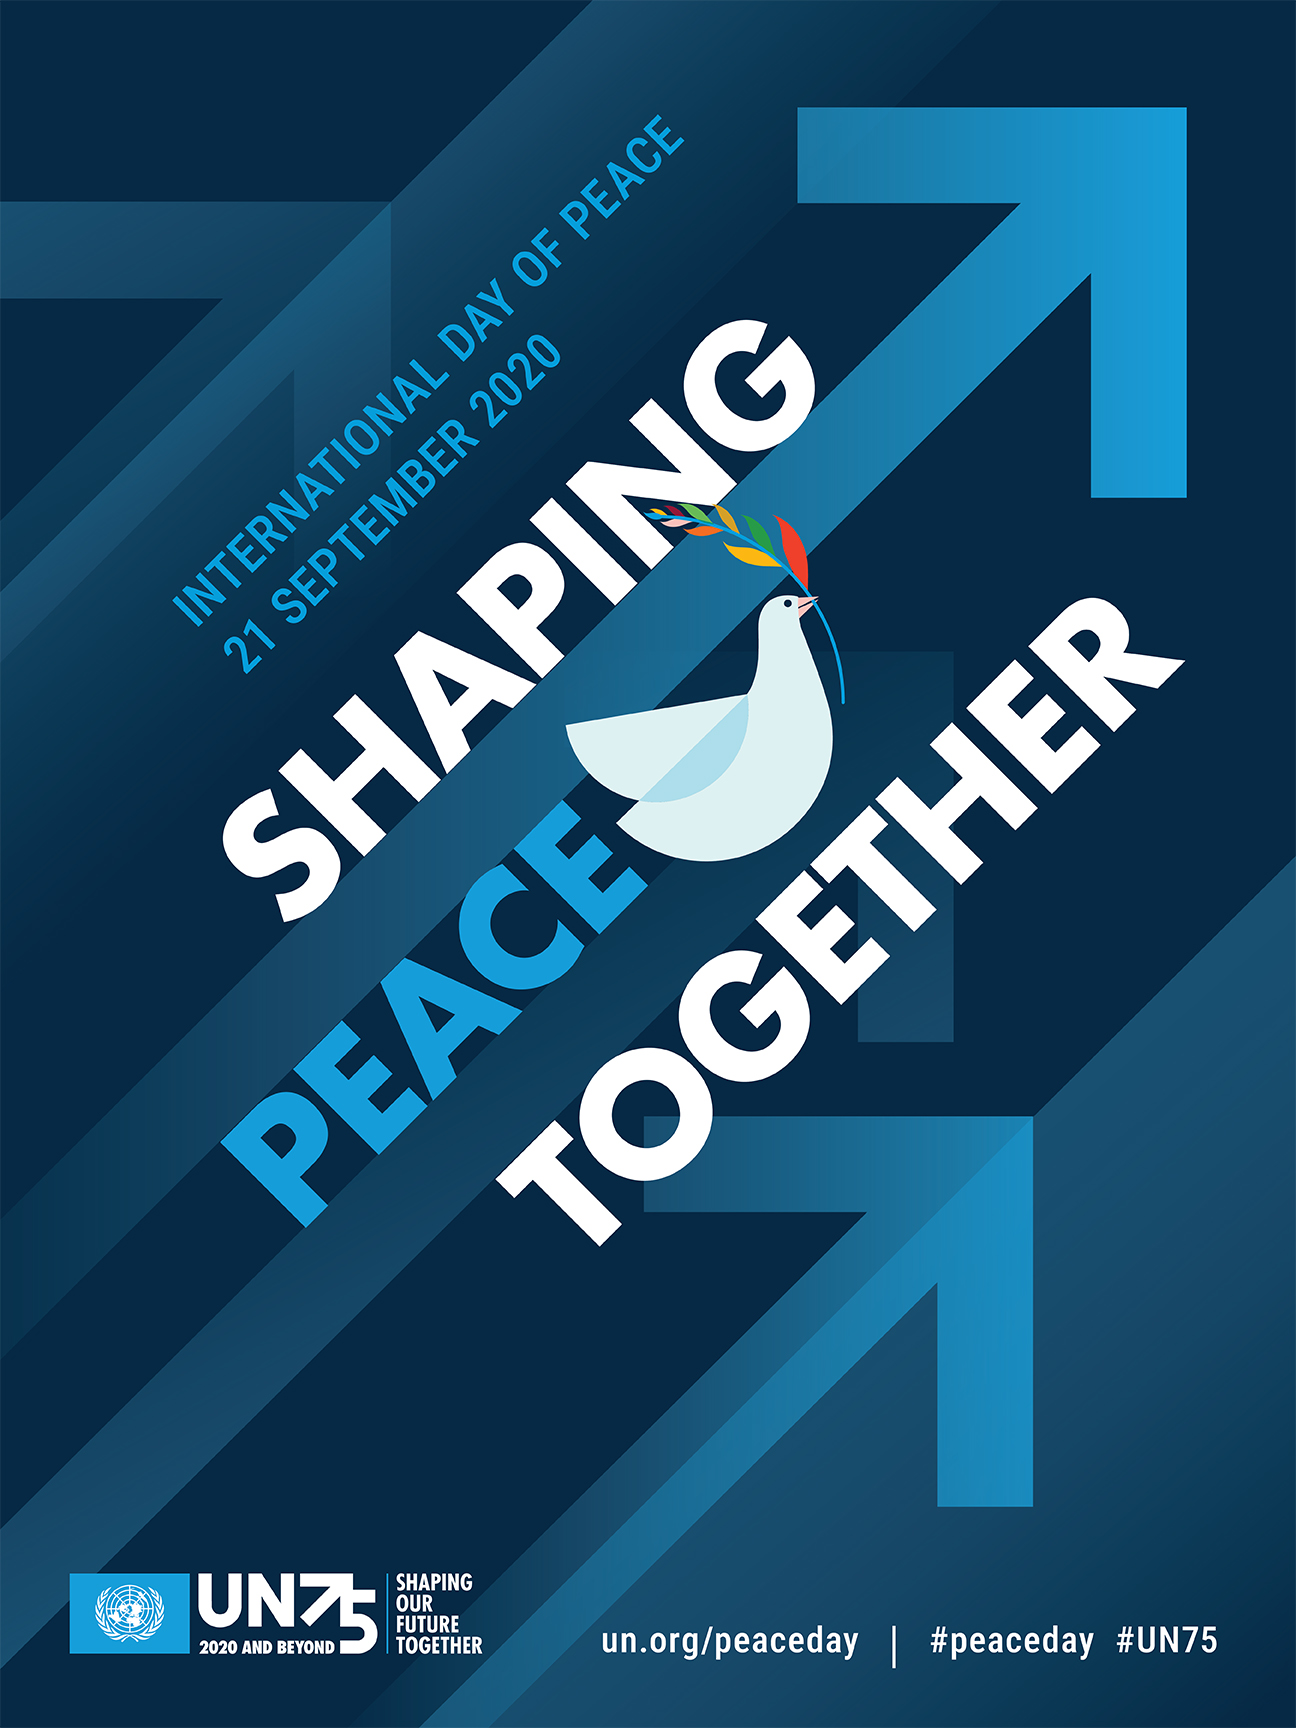 https://worldpeace-jp.org/news/uploads/idp-2020-poster_en.jpg